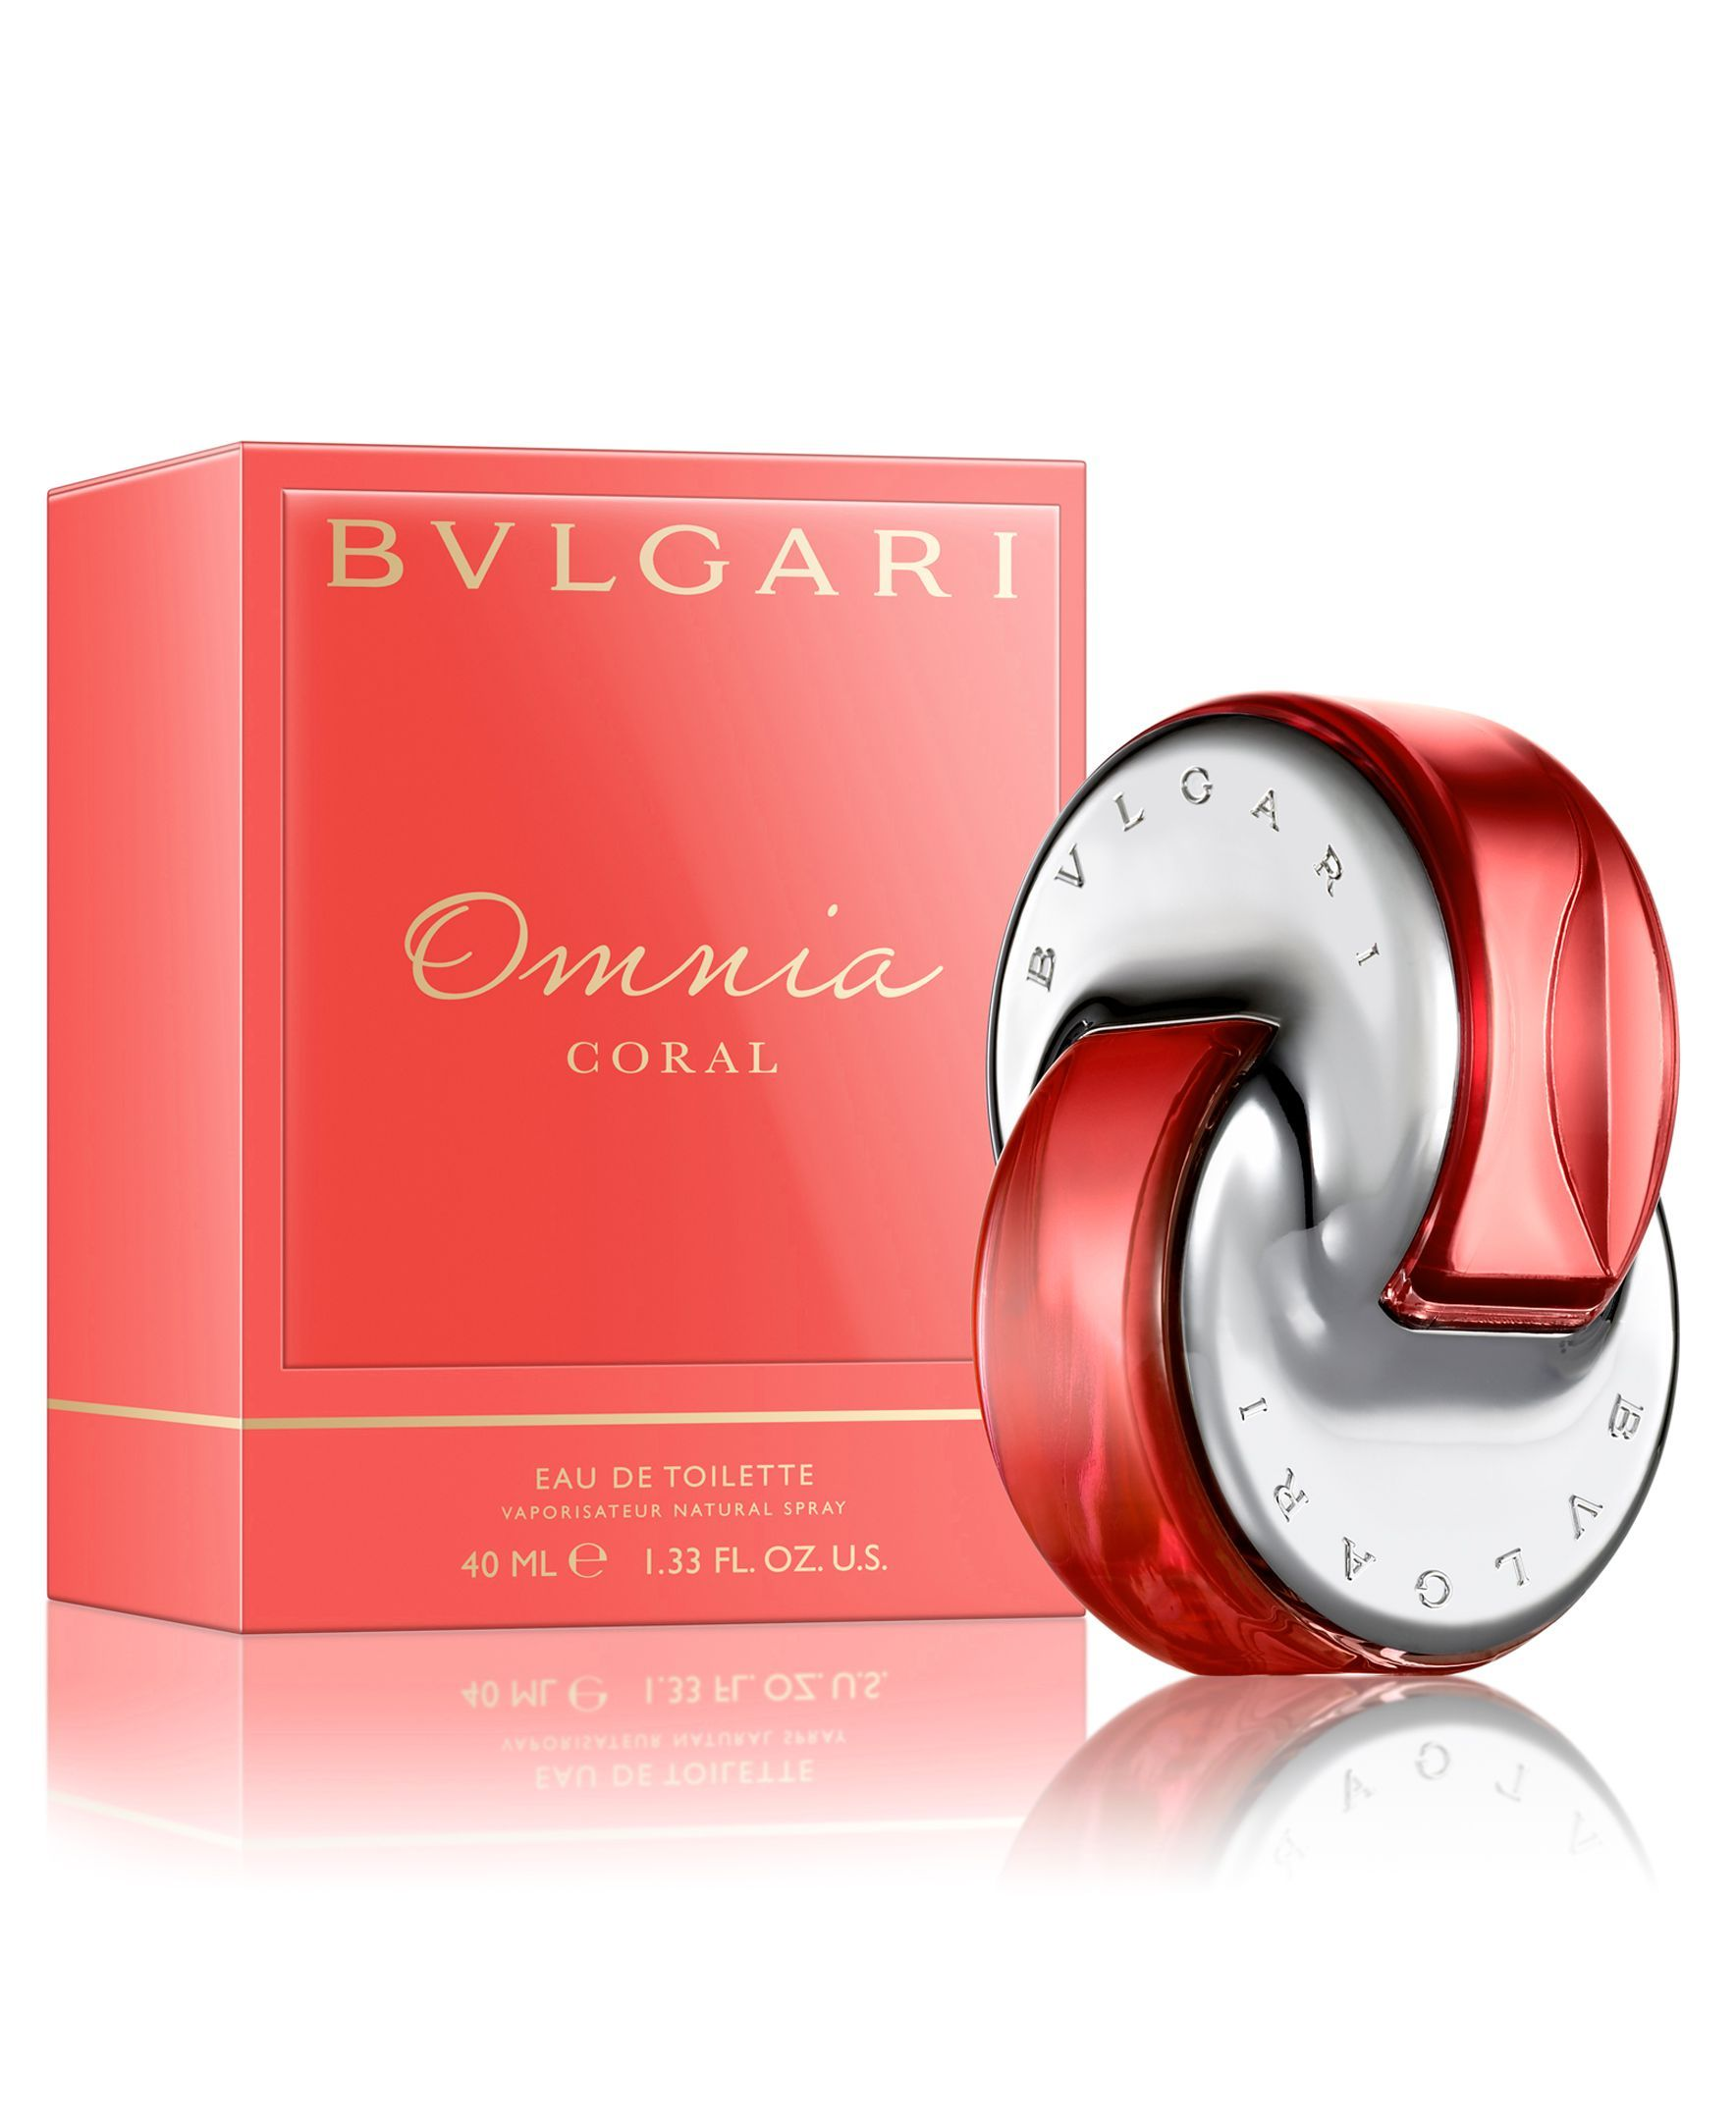 98bd35db23d42 Bvlgari Omnia Coral Eau de Toilette Spray, 1.3 oz   Fragrance ...